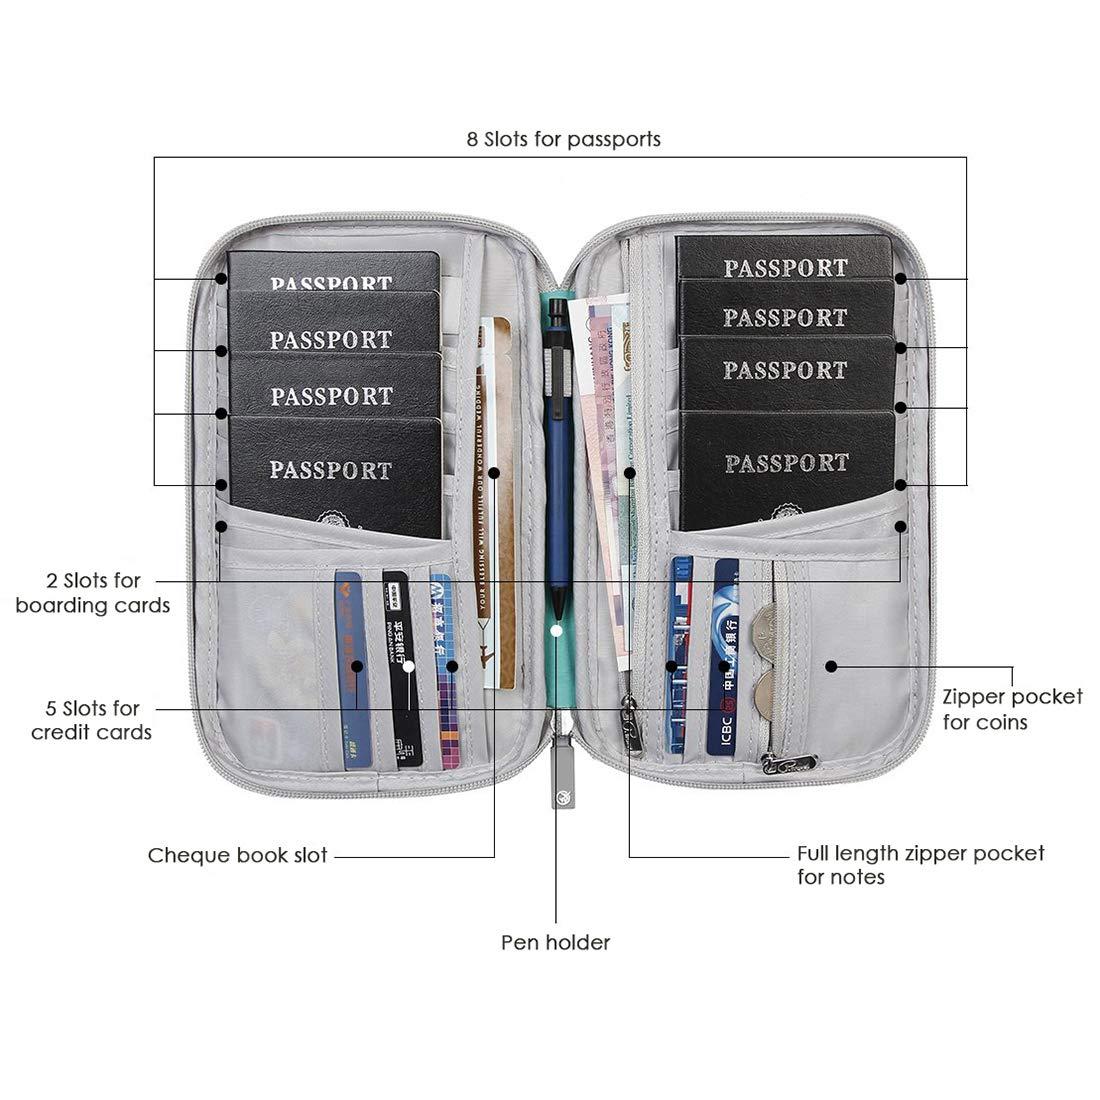 Travel Accessories Storage Organizer for Man and Woman. Passport Holder Family Travel Wallet Document Organizer Bag Grey